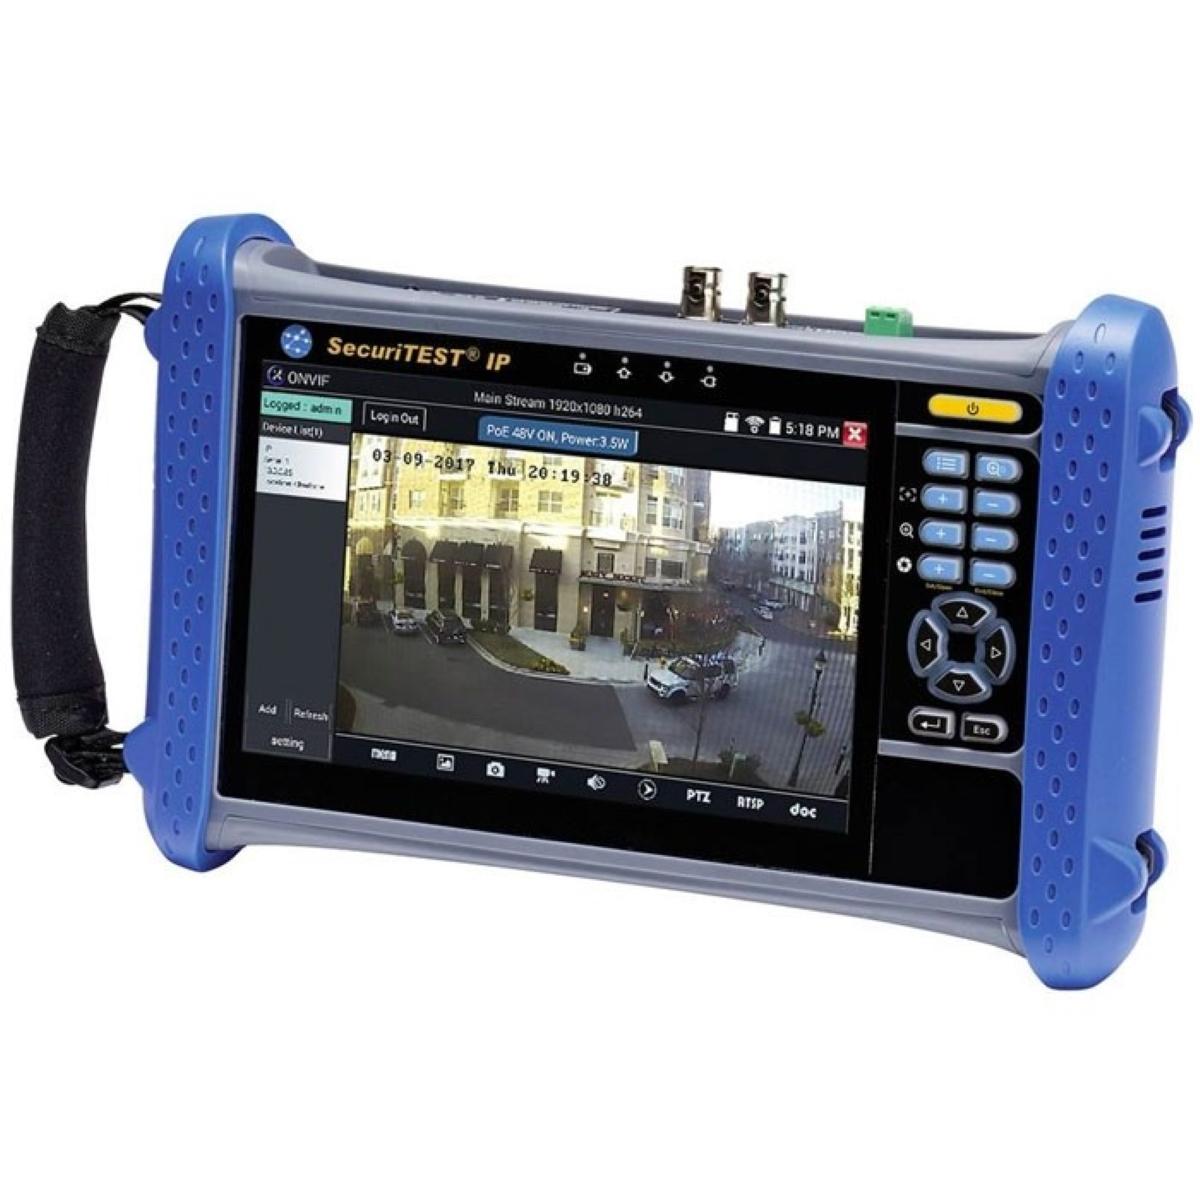 Comprobador de CCTV IDEAL  SECURITEST IP R171000 SECURITESTIP-R171000